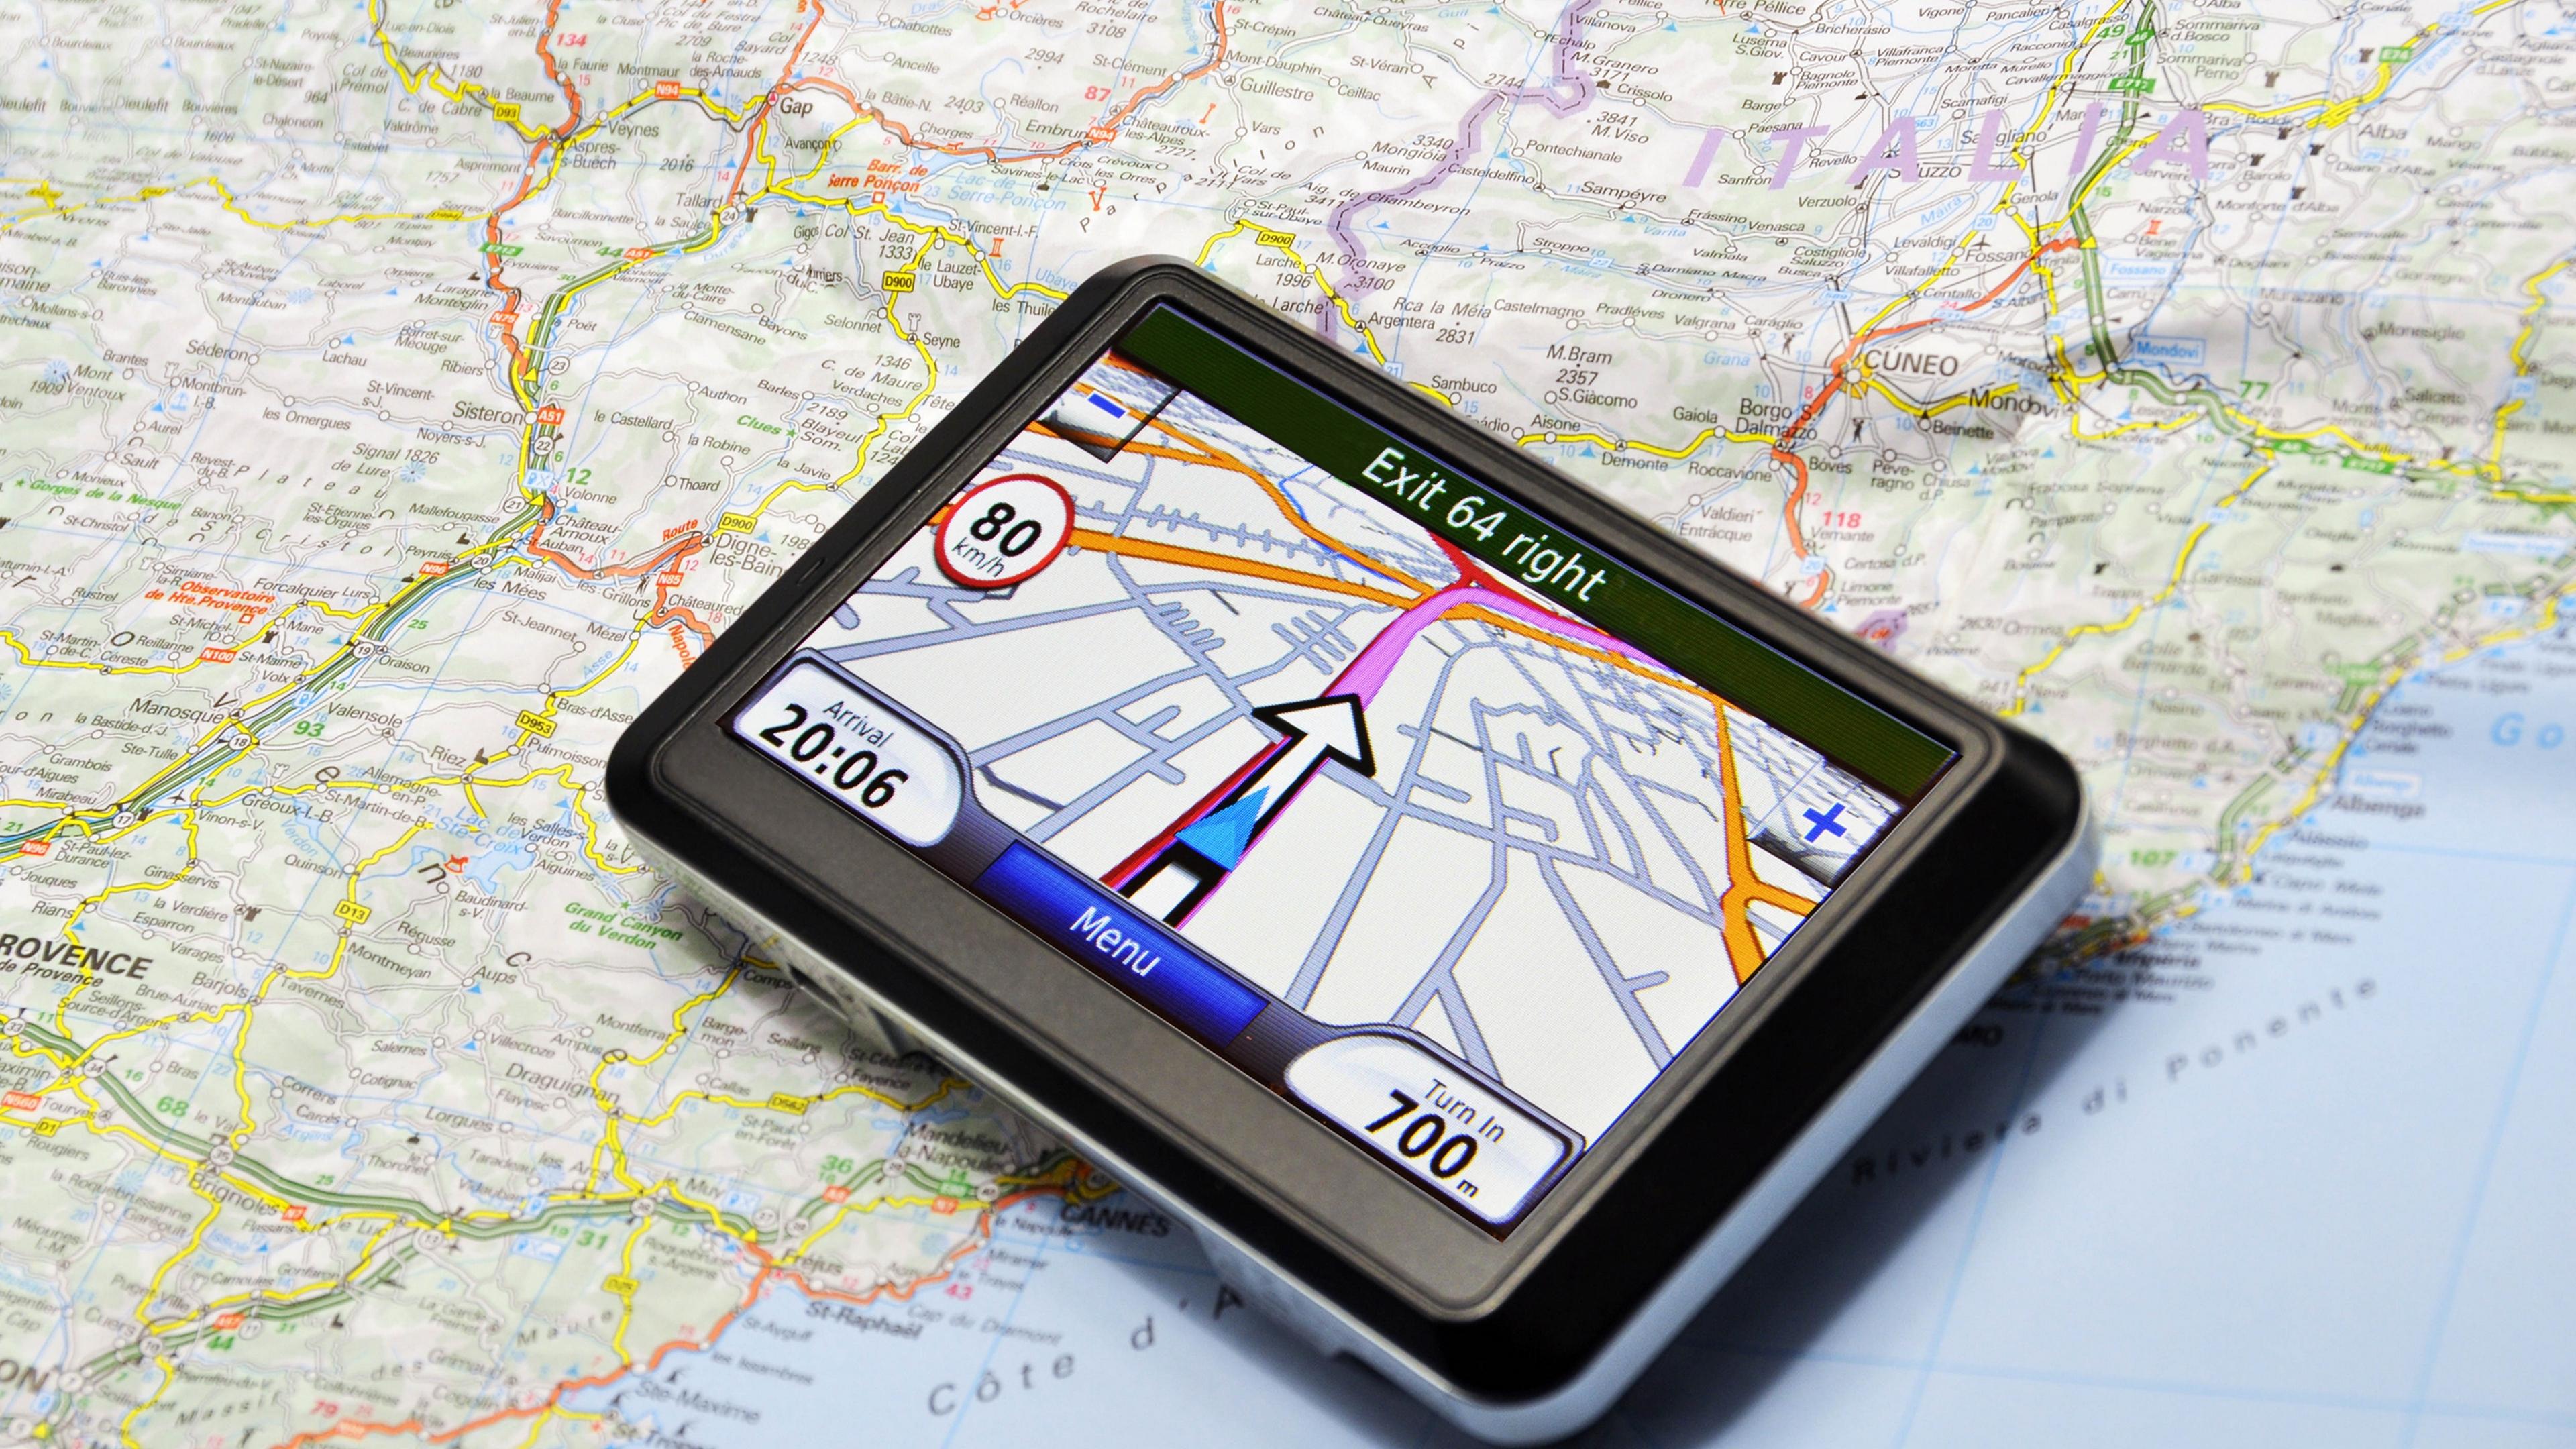 navigation satellite landmark map road 4k 1540062803 - navigation, satellite, landmark, map, road 4k - Satellite, navigation, landmark